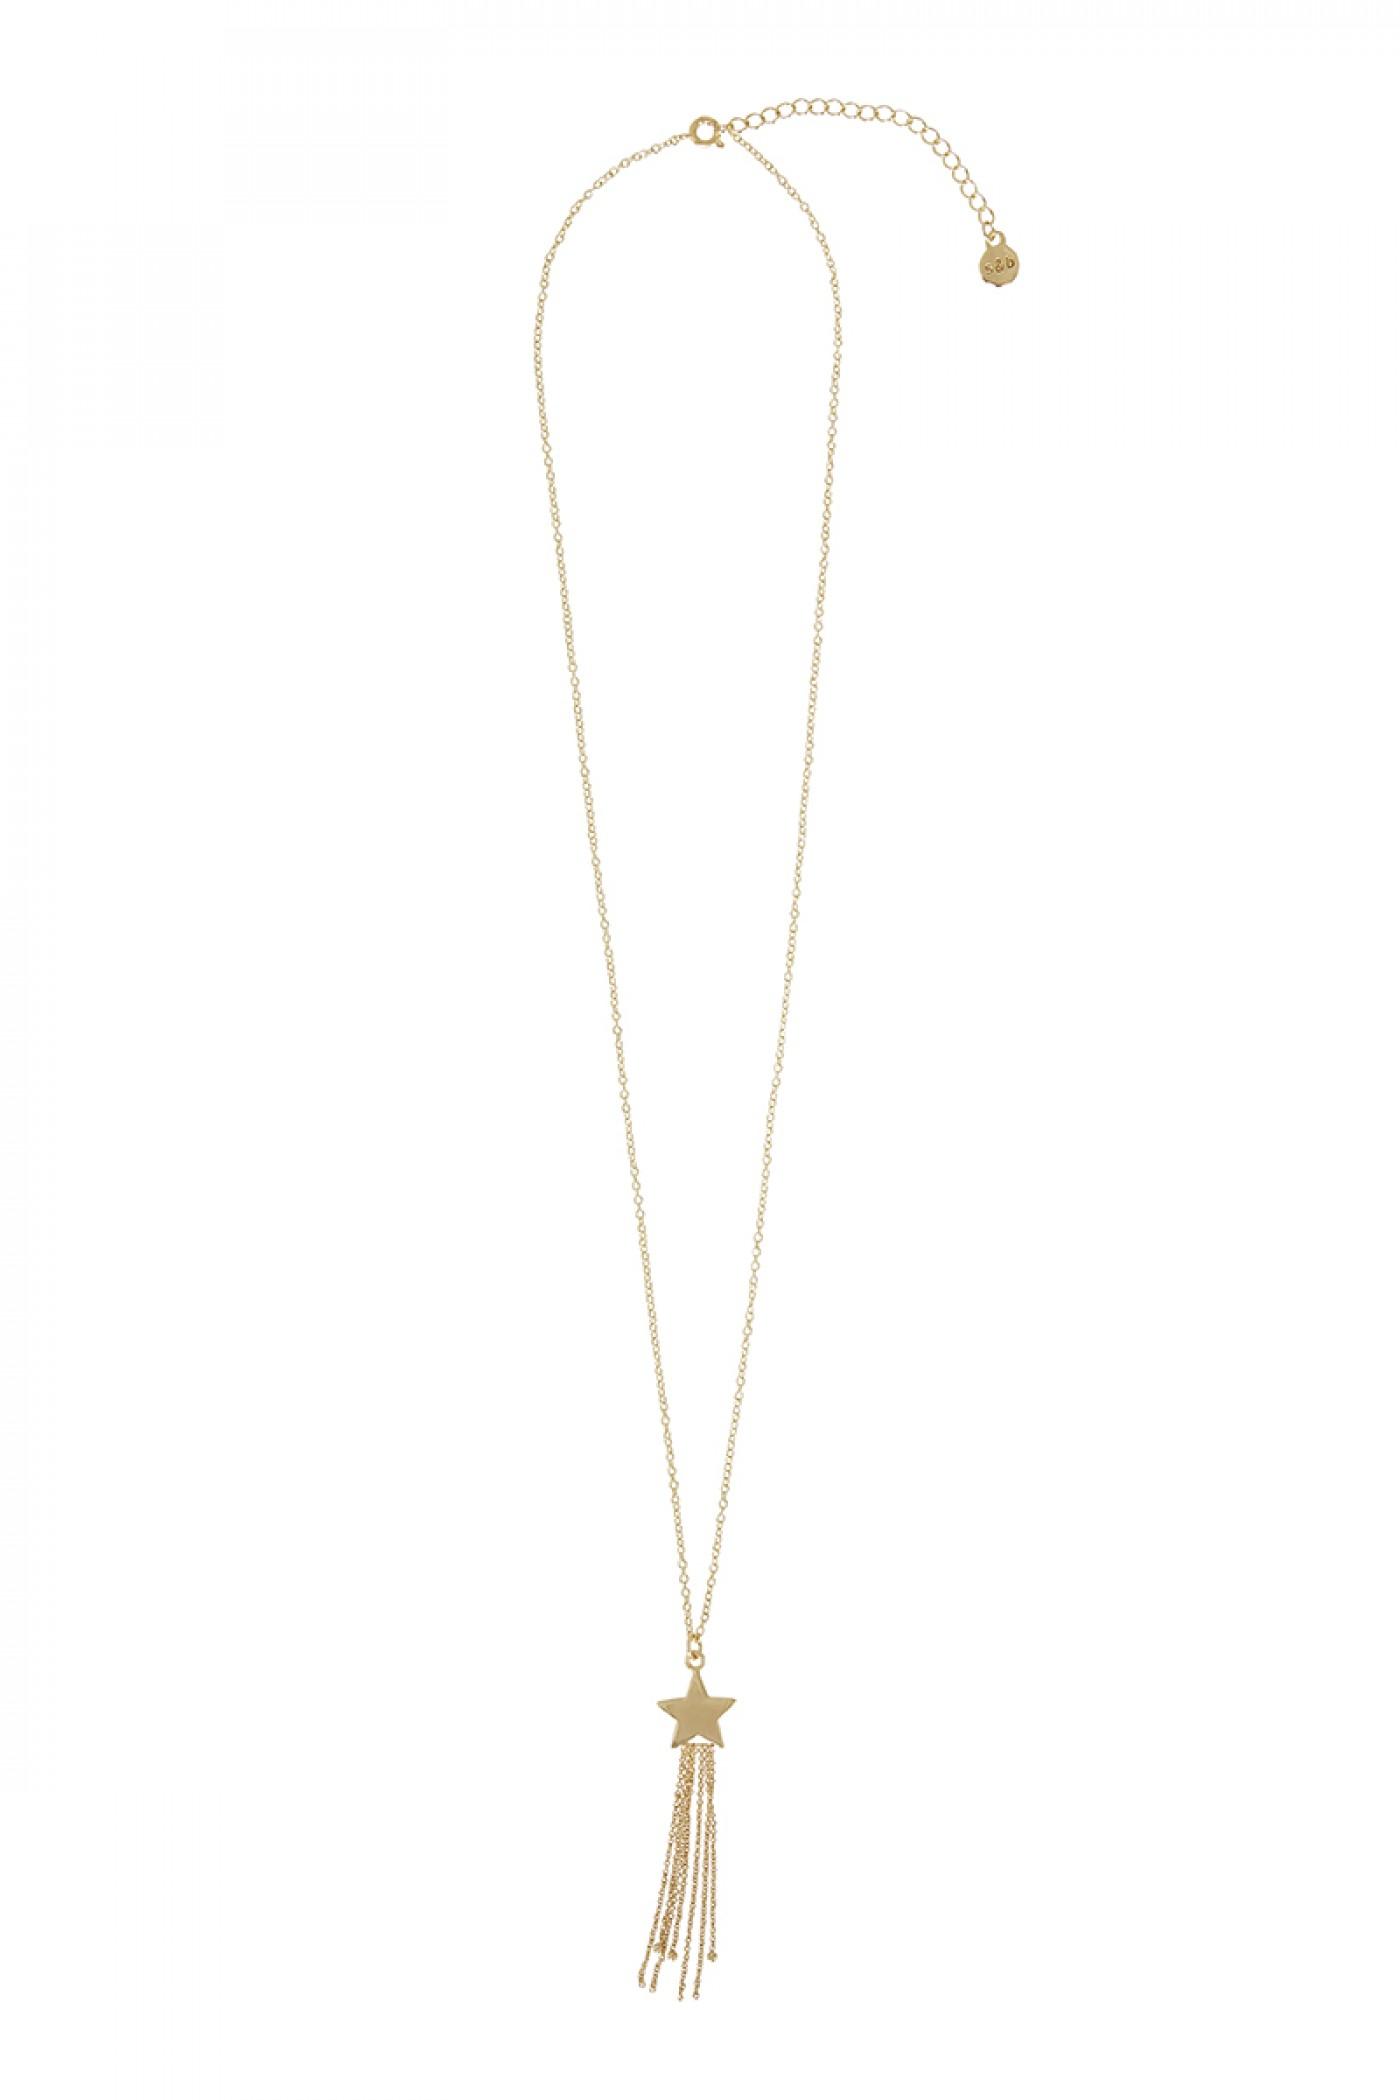 Sass & bide Make A Wish Shooting Stars Necklace in Metallic